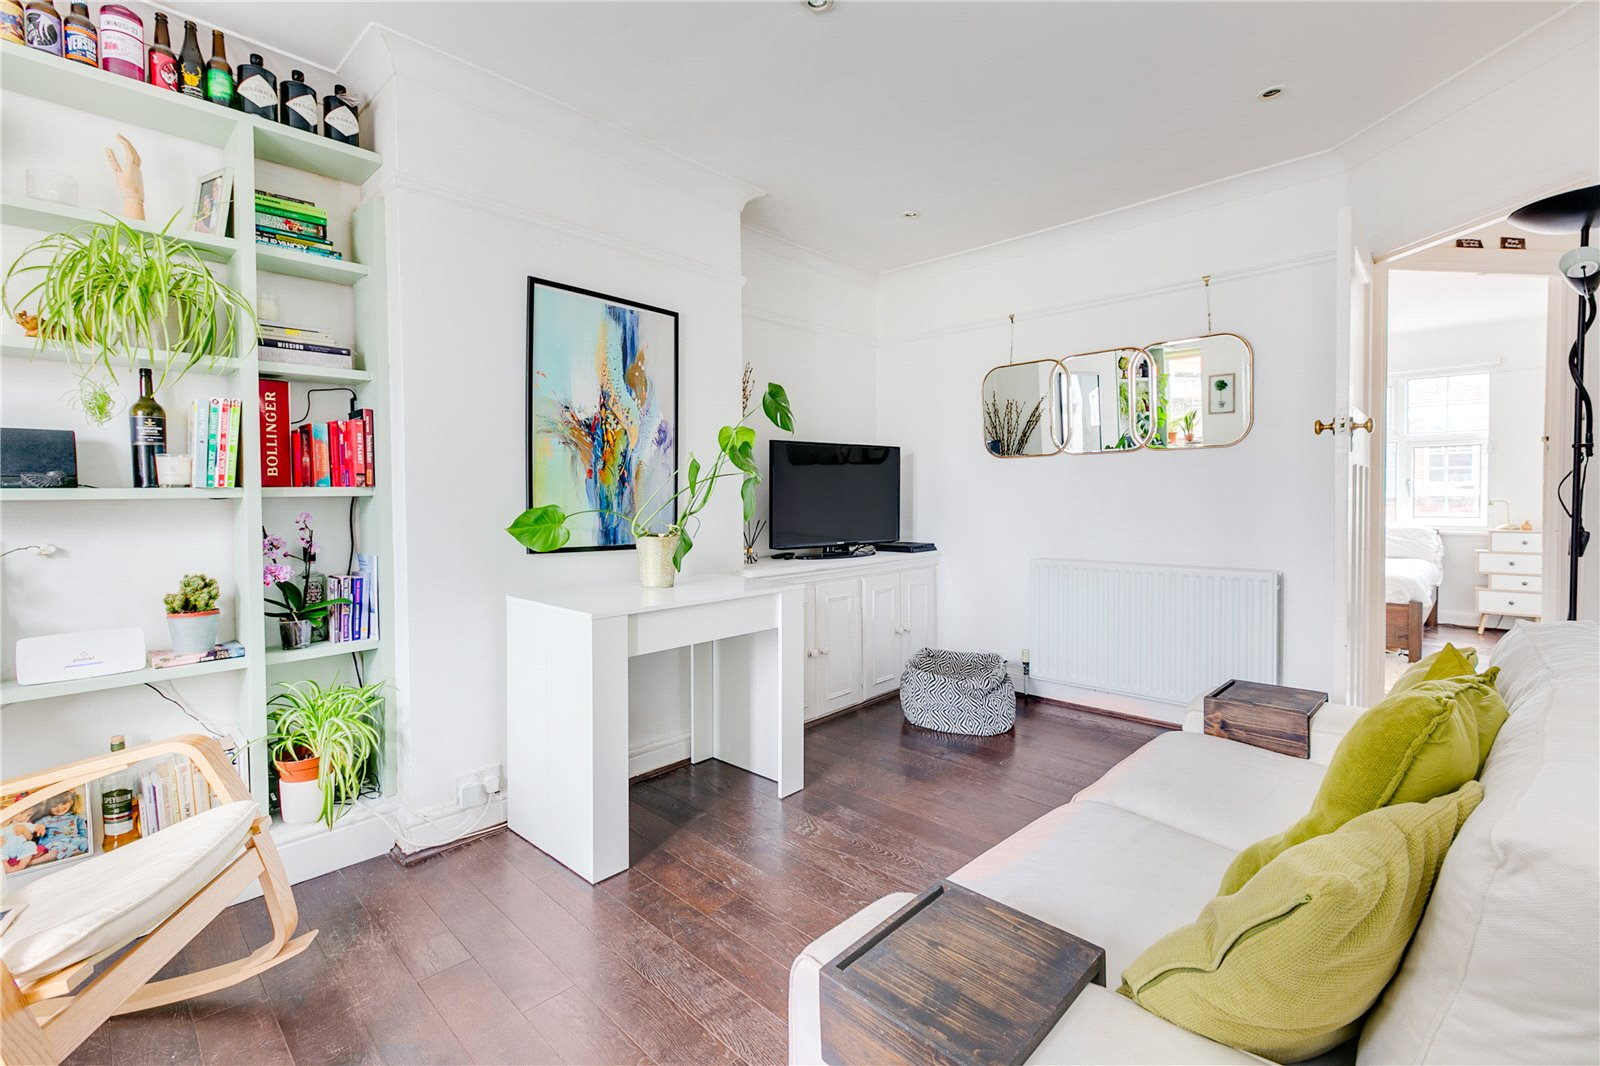 Property in Twickenham